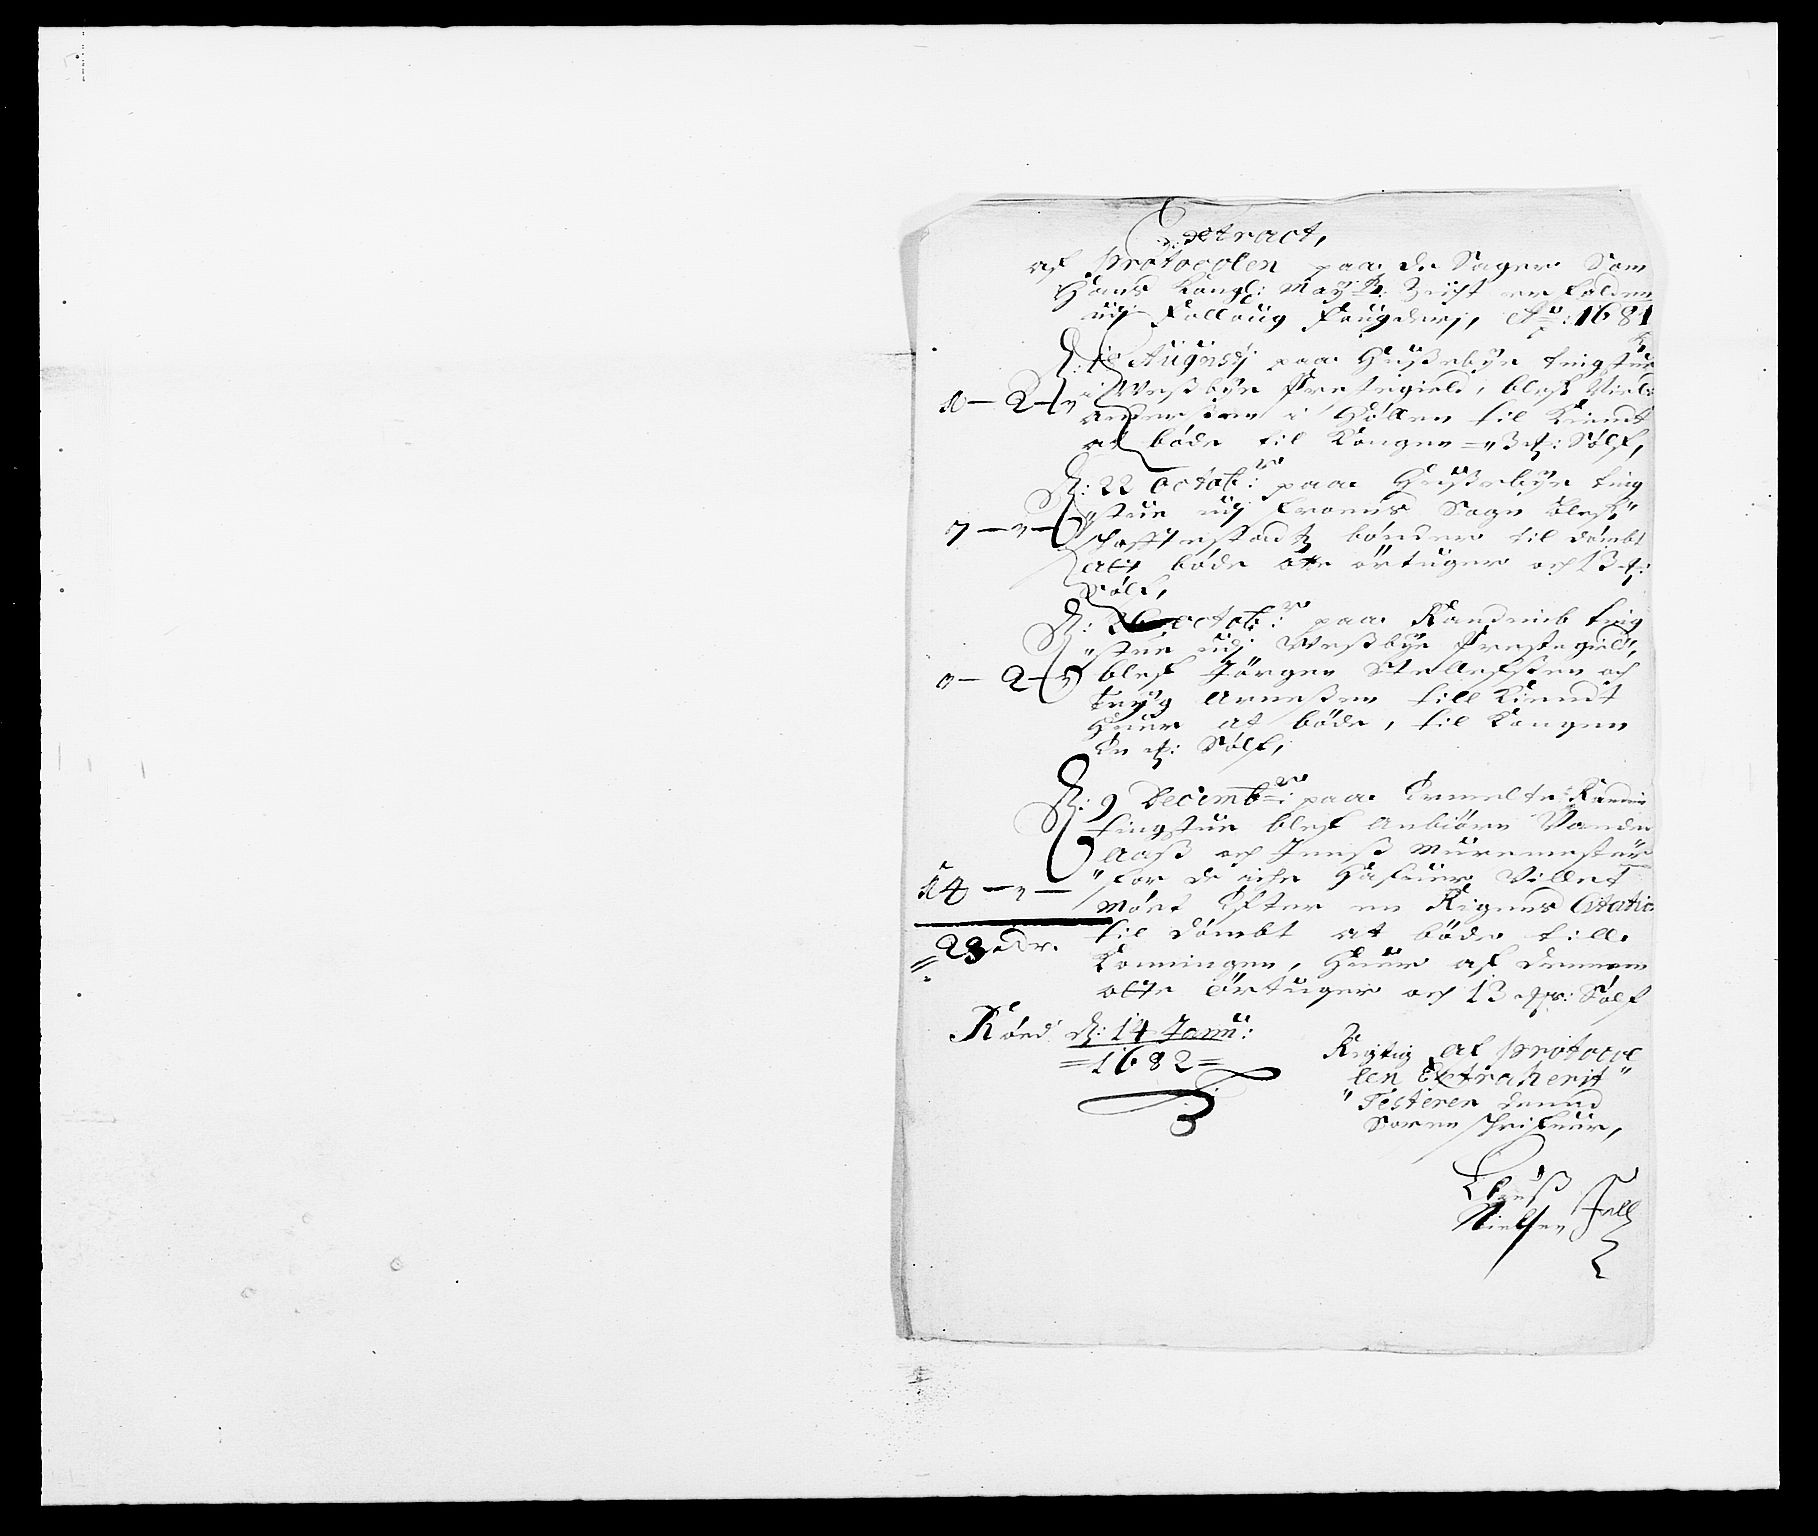 RA, Rentekammeret inntil 1814, Reviderte regnskaper, Fogderegnskap, R09/L0429: Fogderegnskap Follo, 1680-1681, s. 257